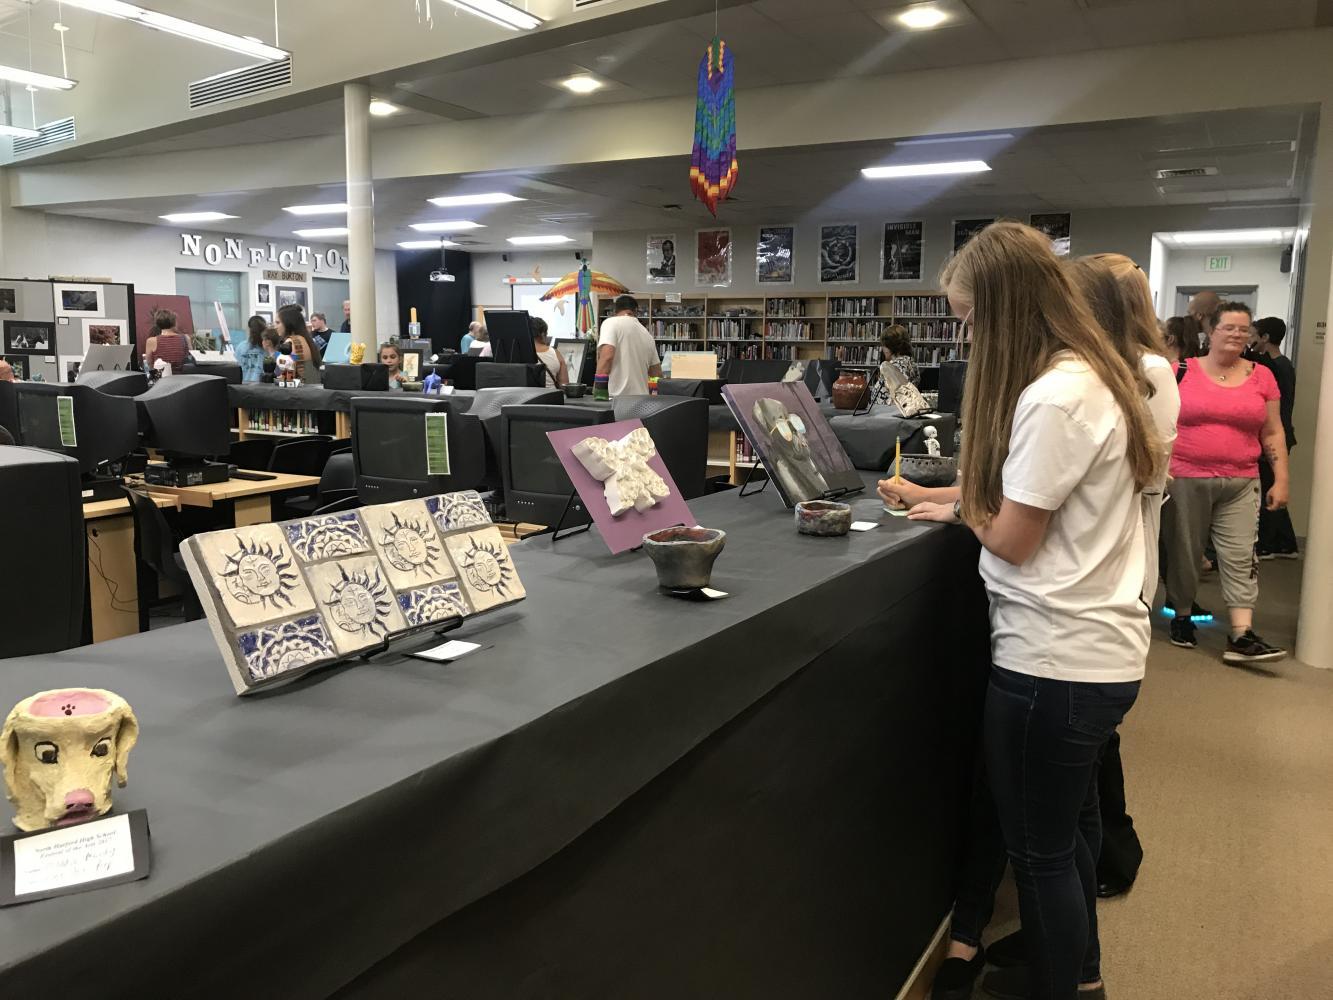 Students gaze at their peers artwork as they visit the displays.